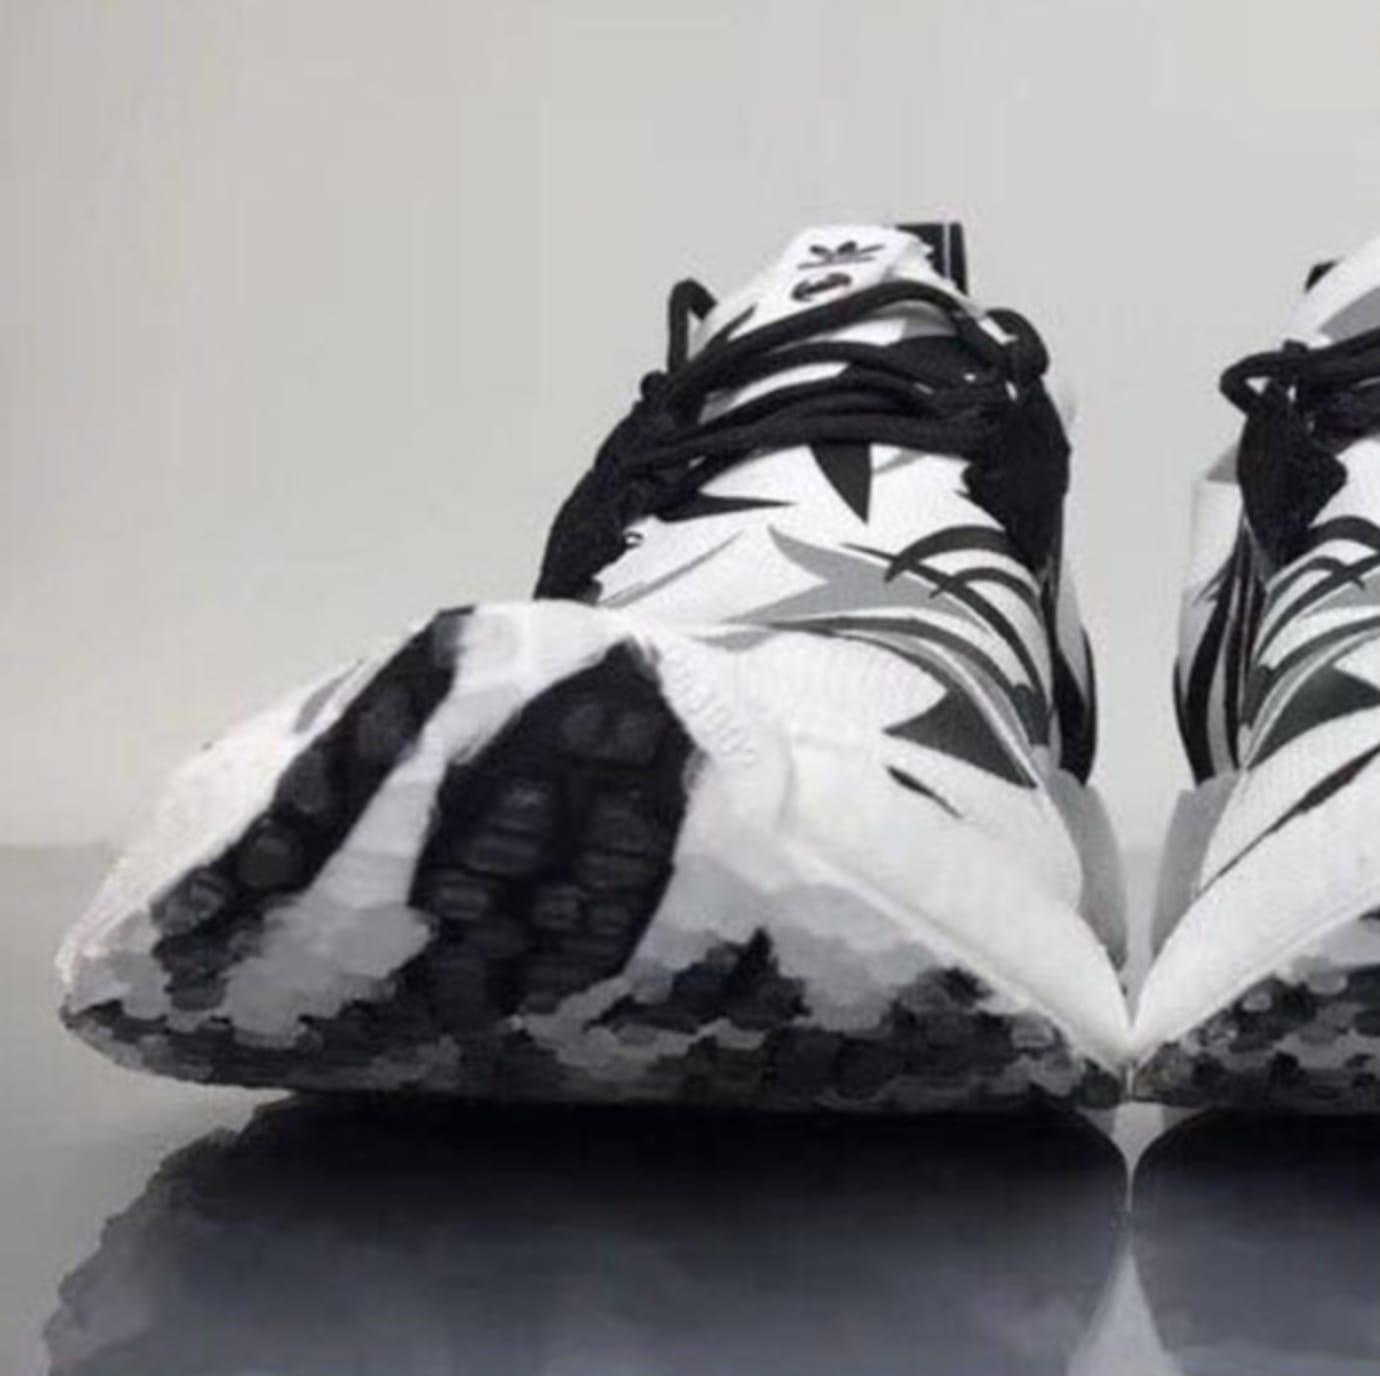 Adidas NMD_Racer x Juice 'Alienegra' (Toe)